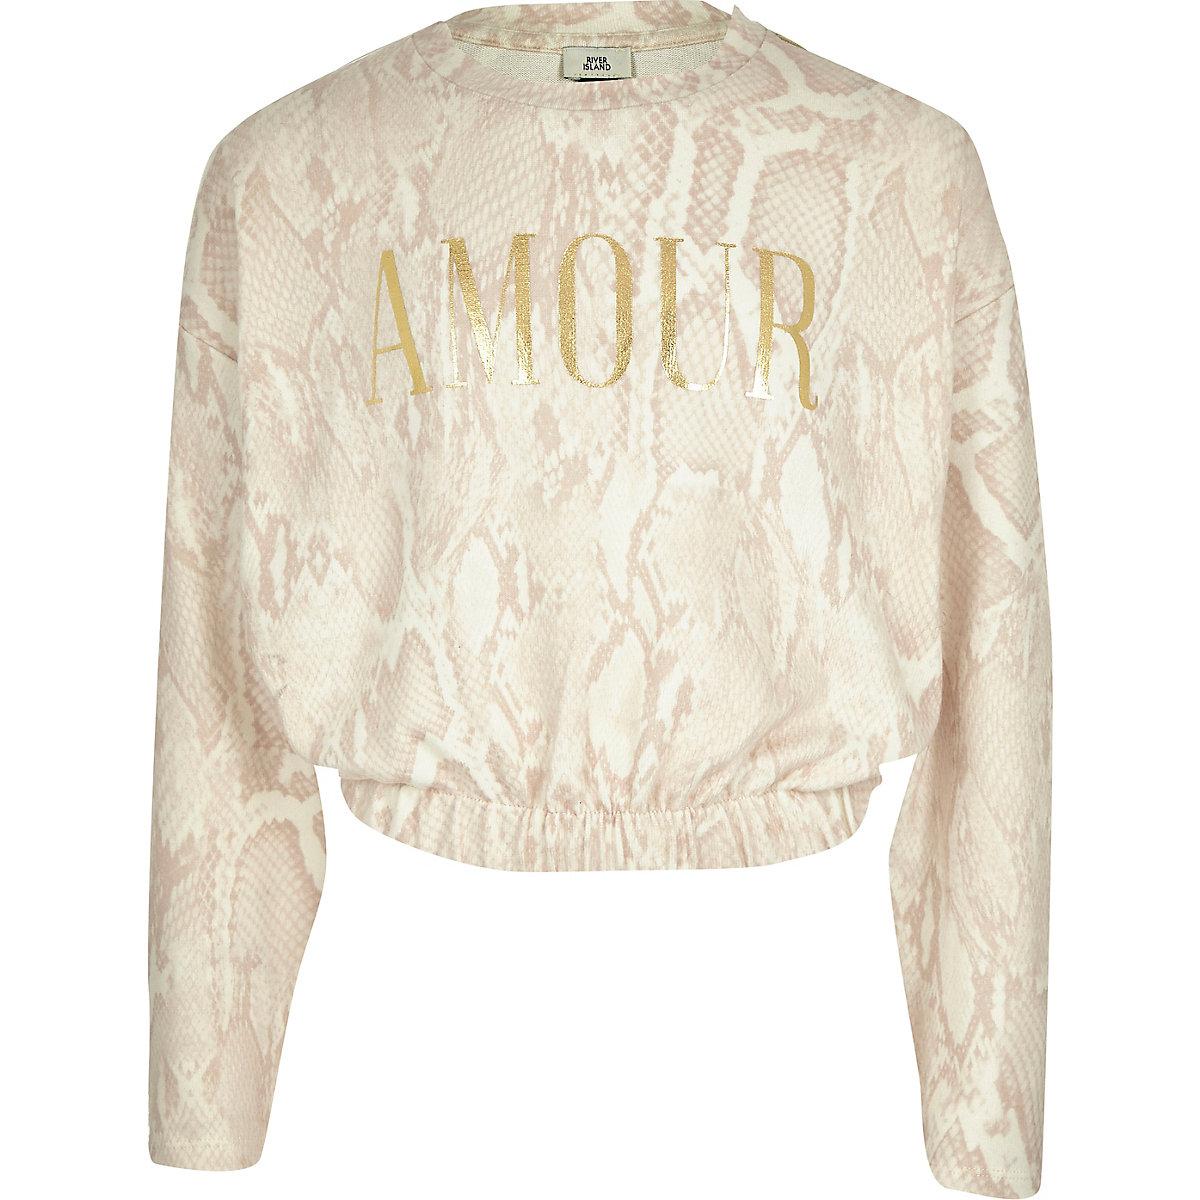 Girls cream snake 'Amour' cosy sweatshirt